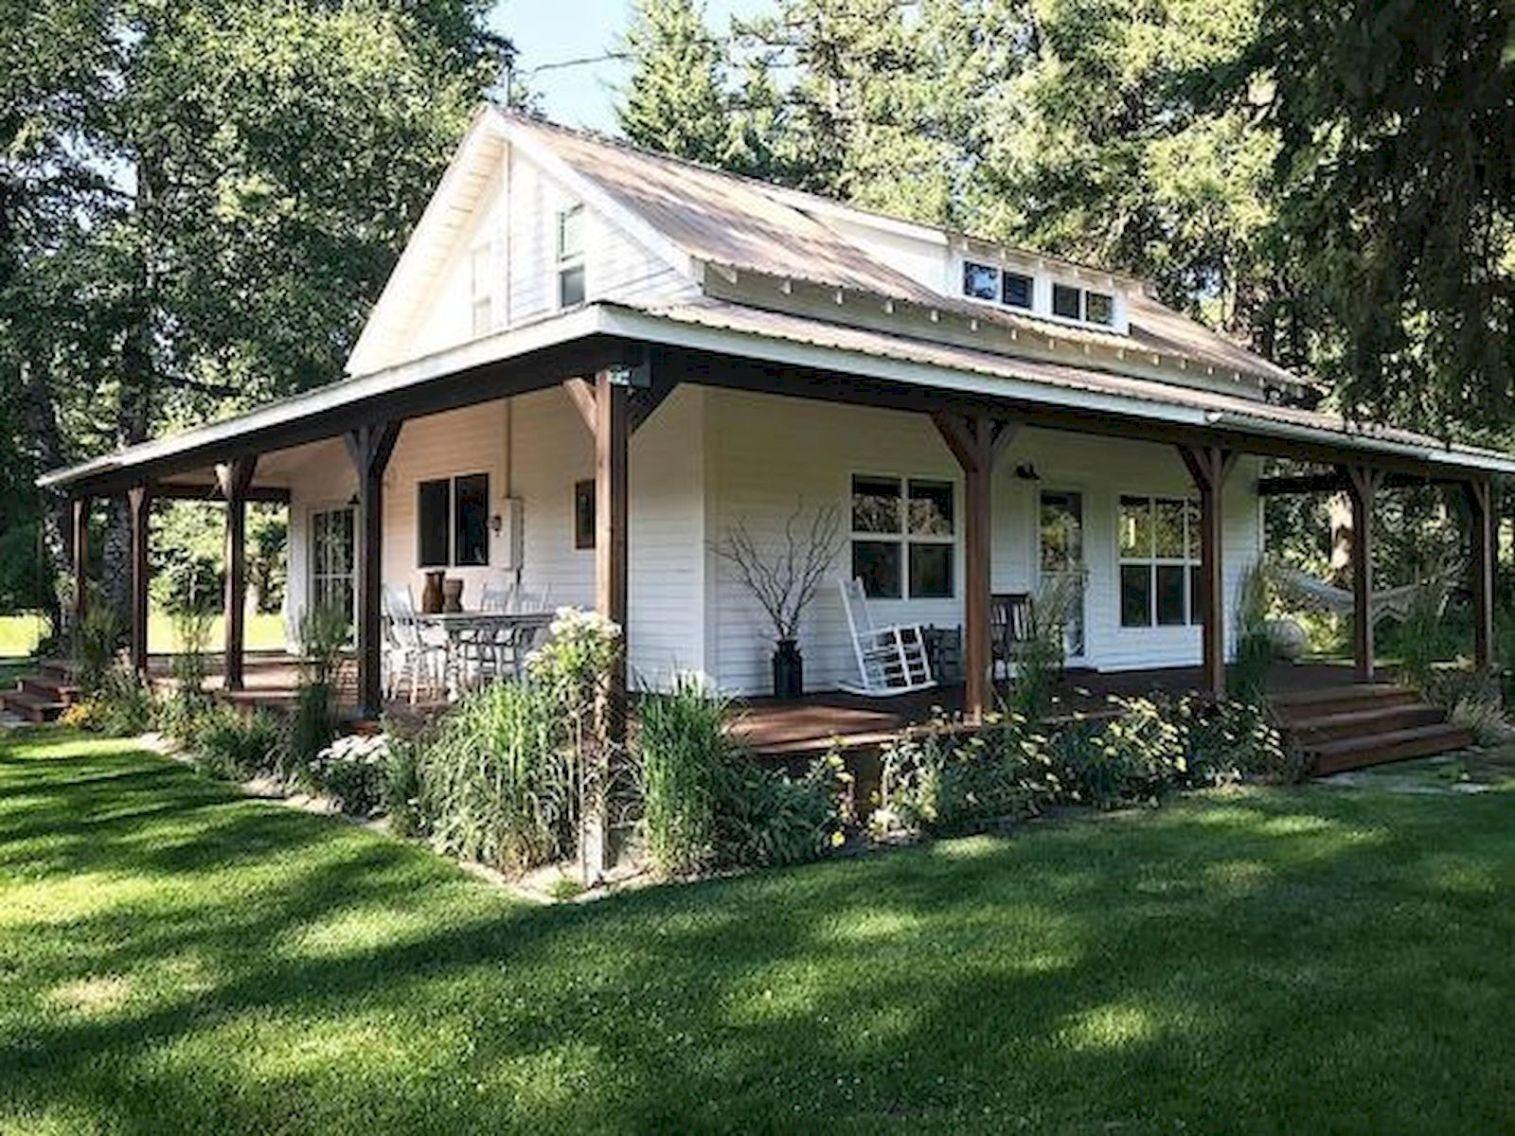 25 Rural Farmhouse Cottage Design Ideas With Artistic Touch Decorrea Com Modern Farmhouse Exterior Small House Exteriors Farmhouse Exterior